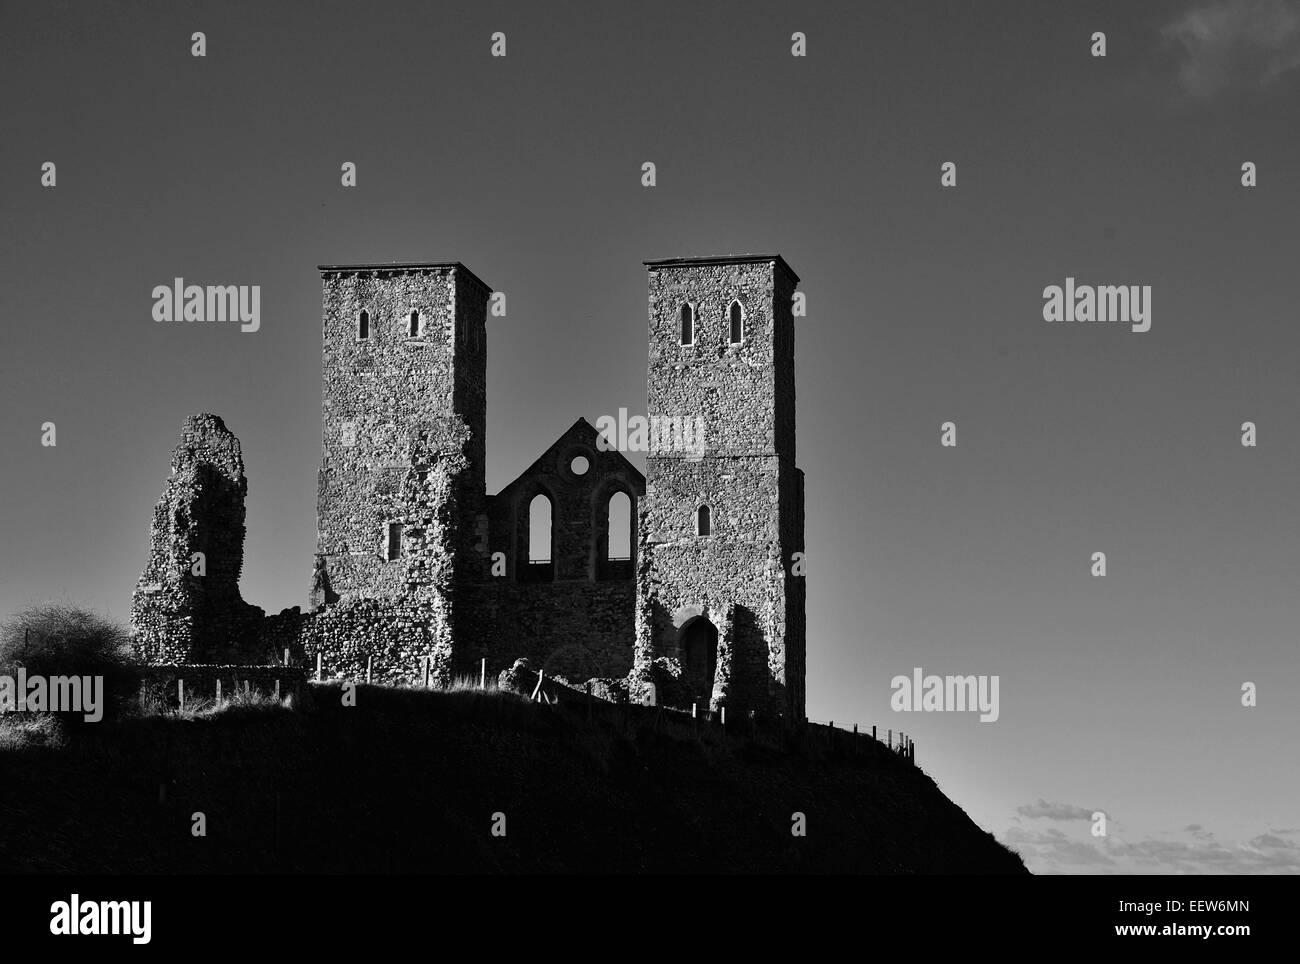 St Mary´s Church at Reculver, Kent, UK - Stock Image